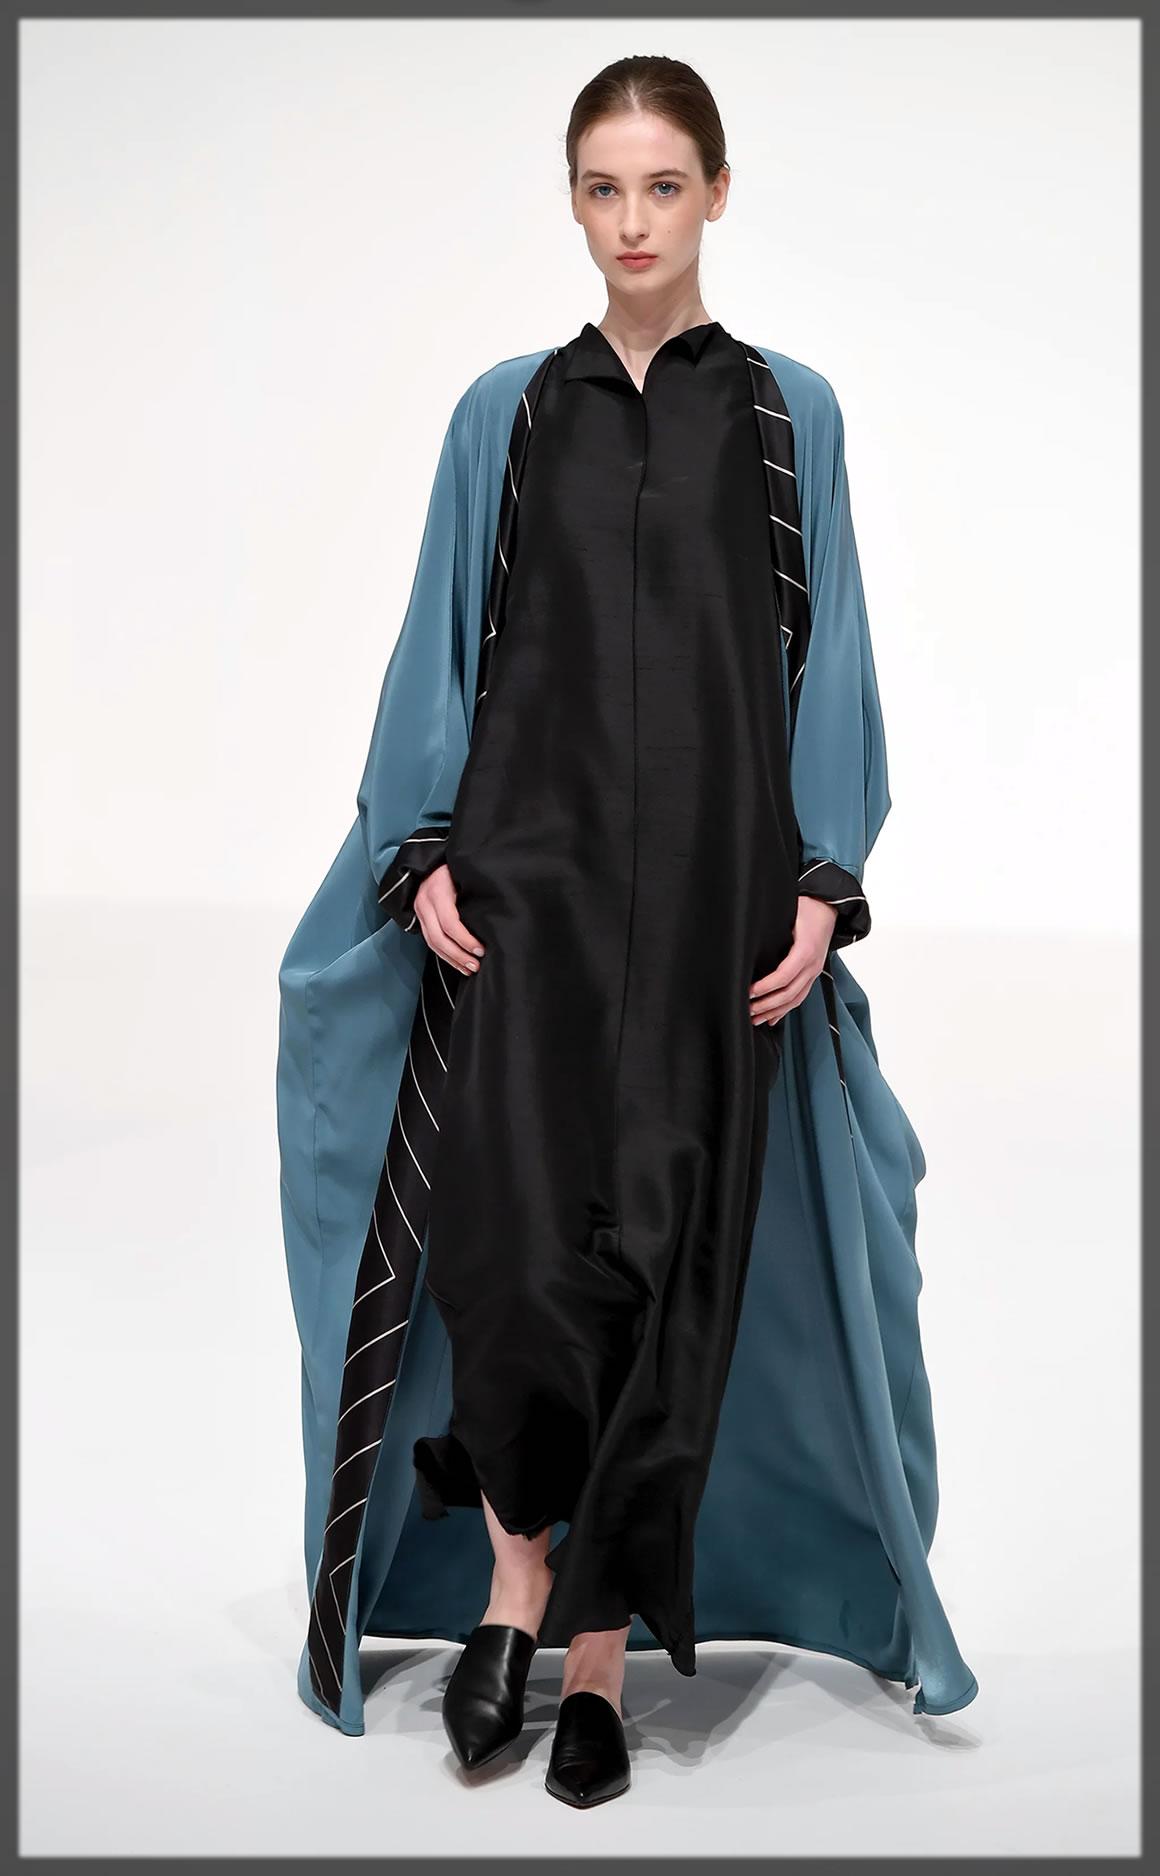 Ghudfah Dubai style abaya